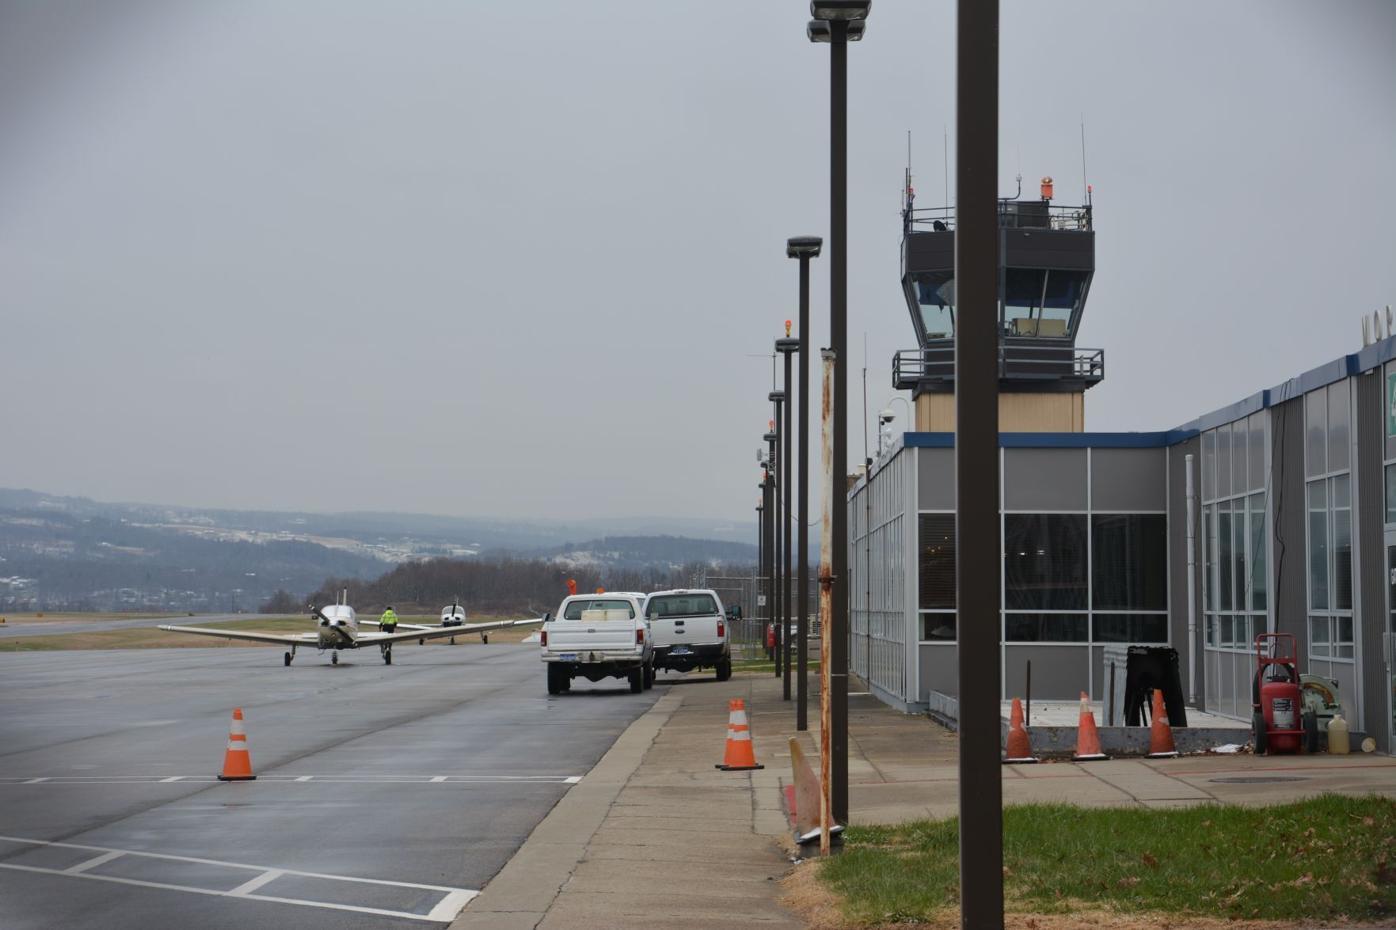 Morgantown Municipal Airport building